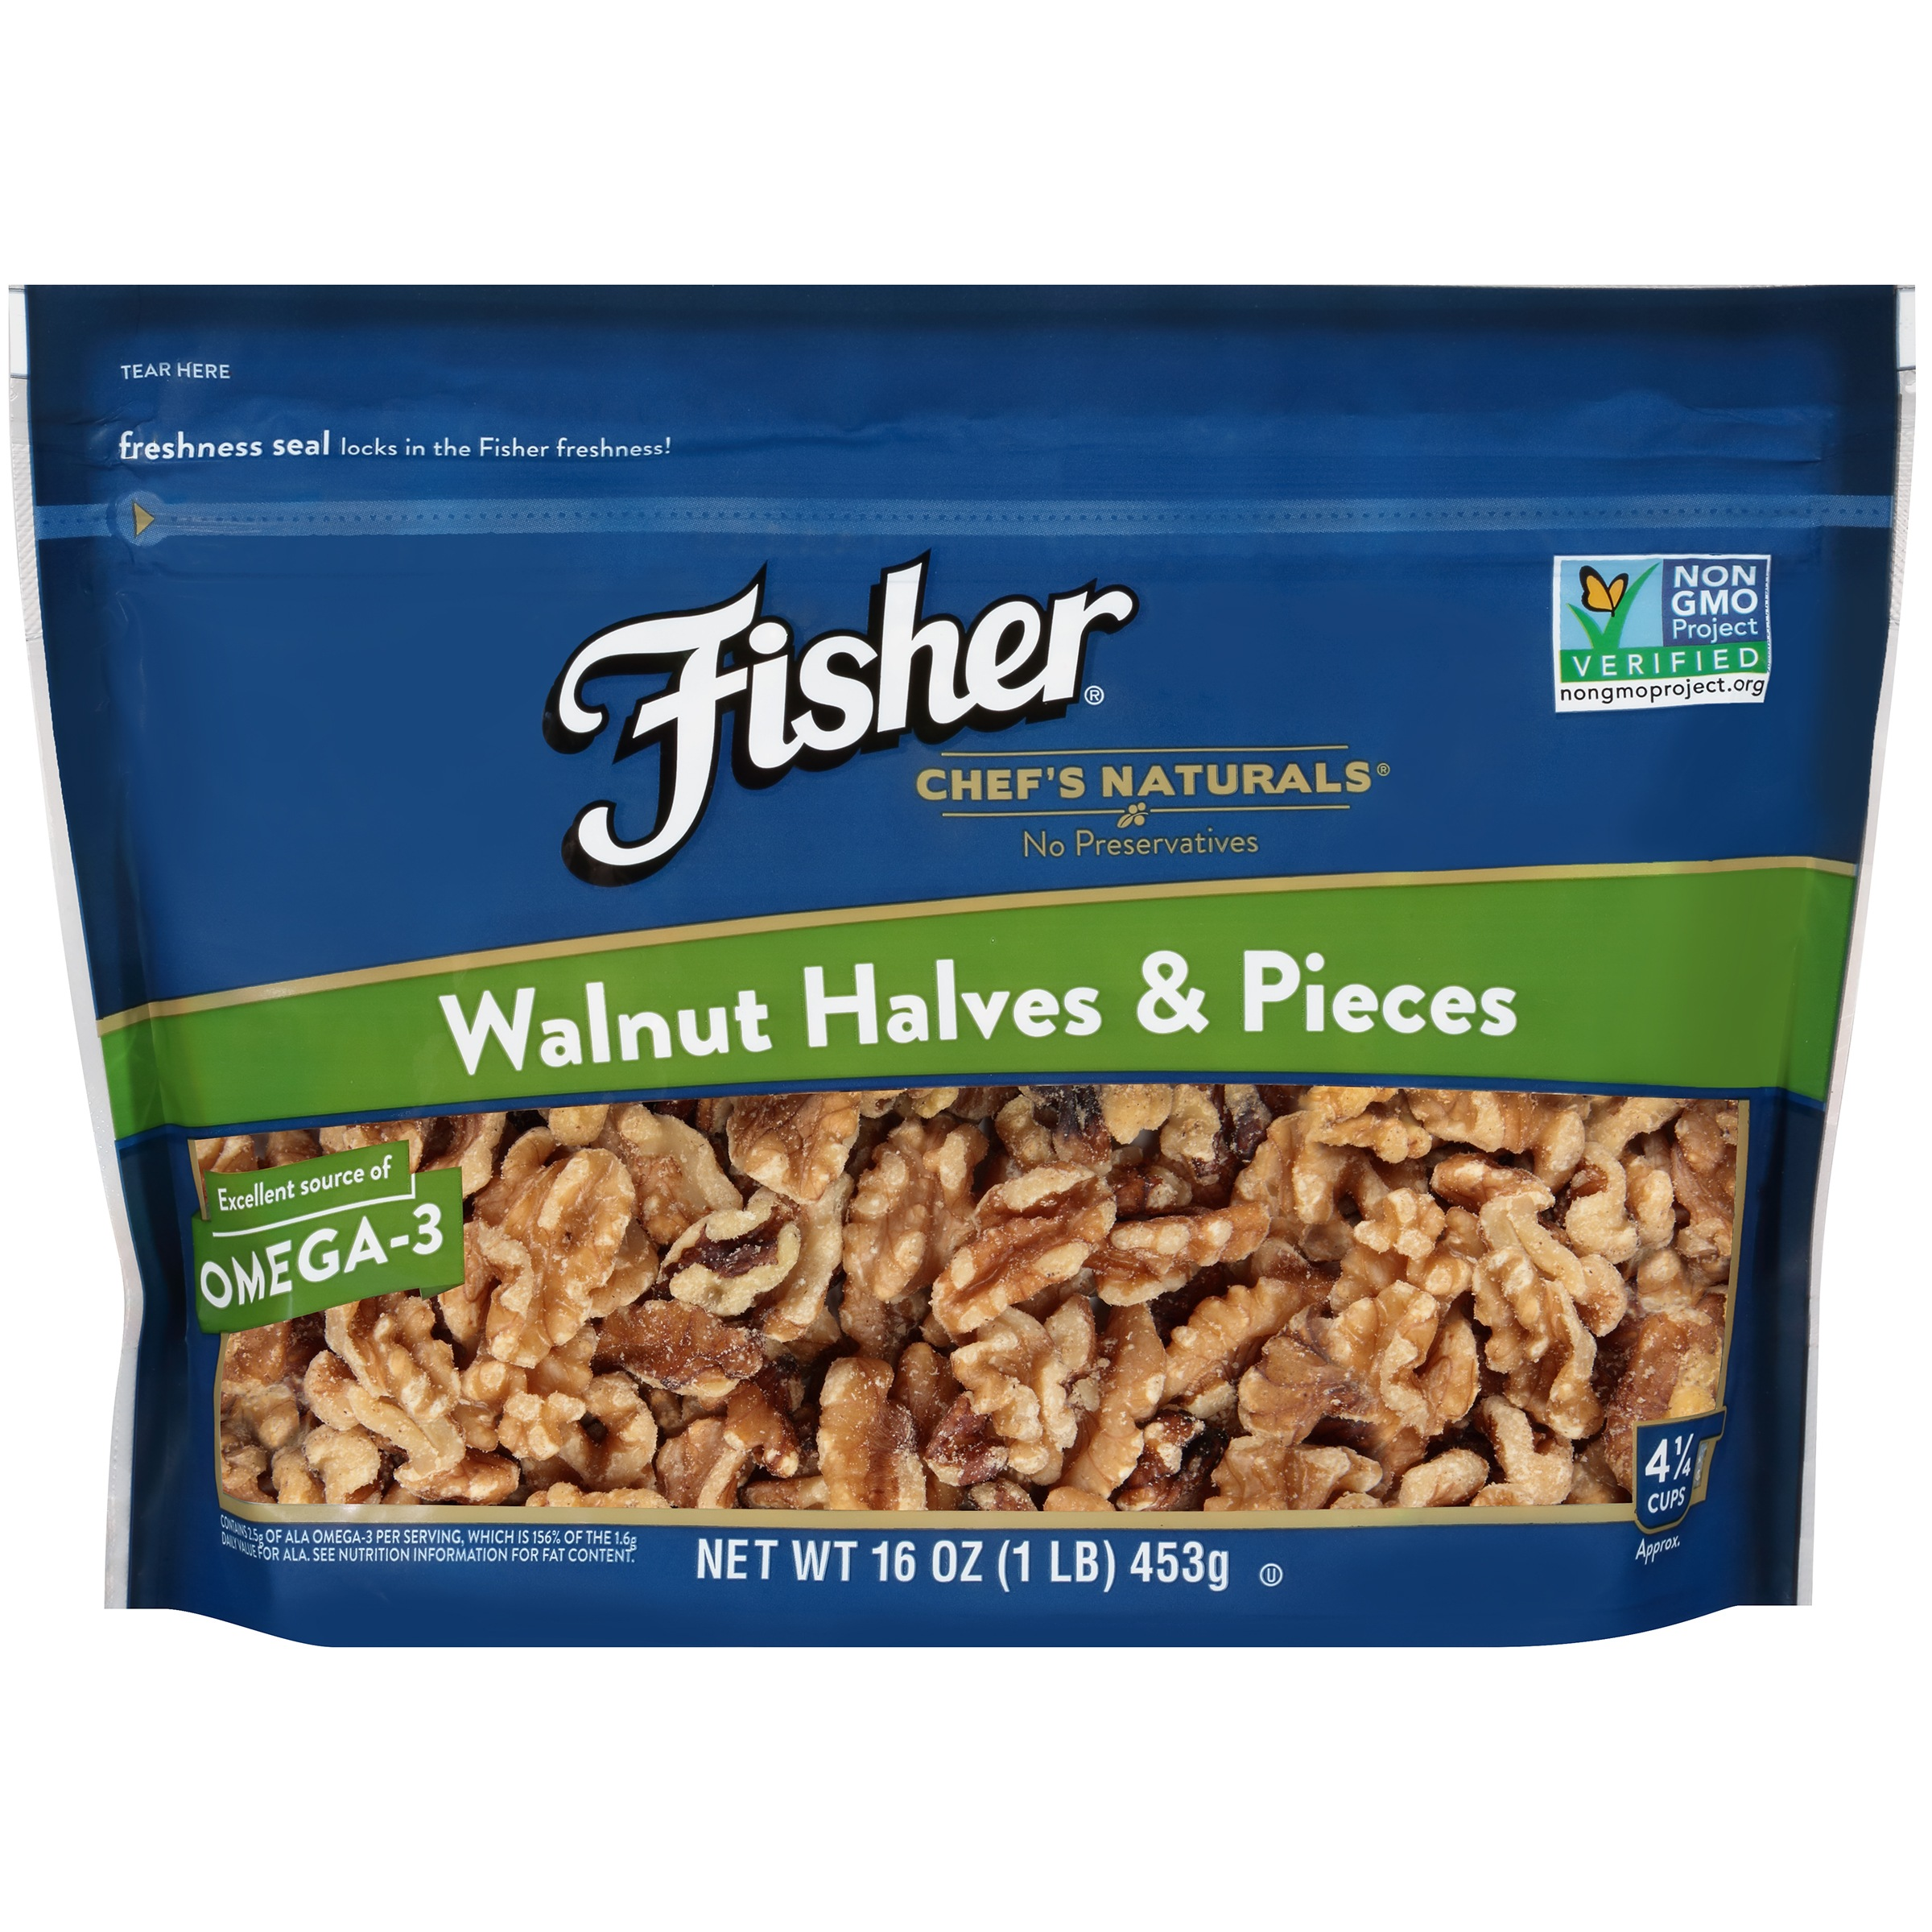 Fisher Chef's Naturals Walnut Halves & Pieces, 16 oz